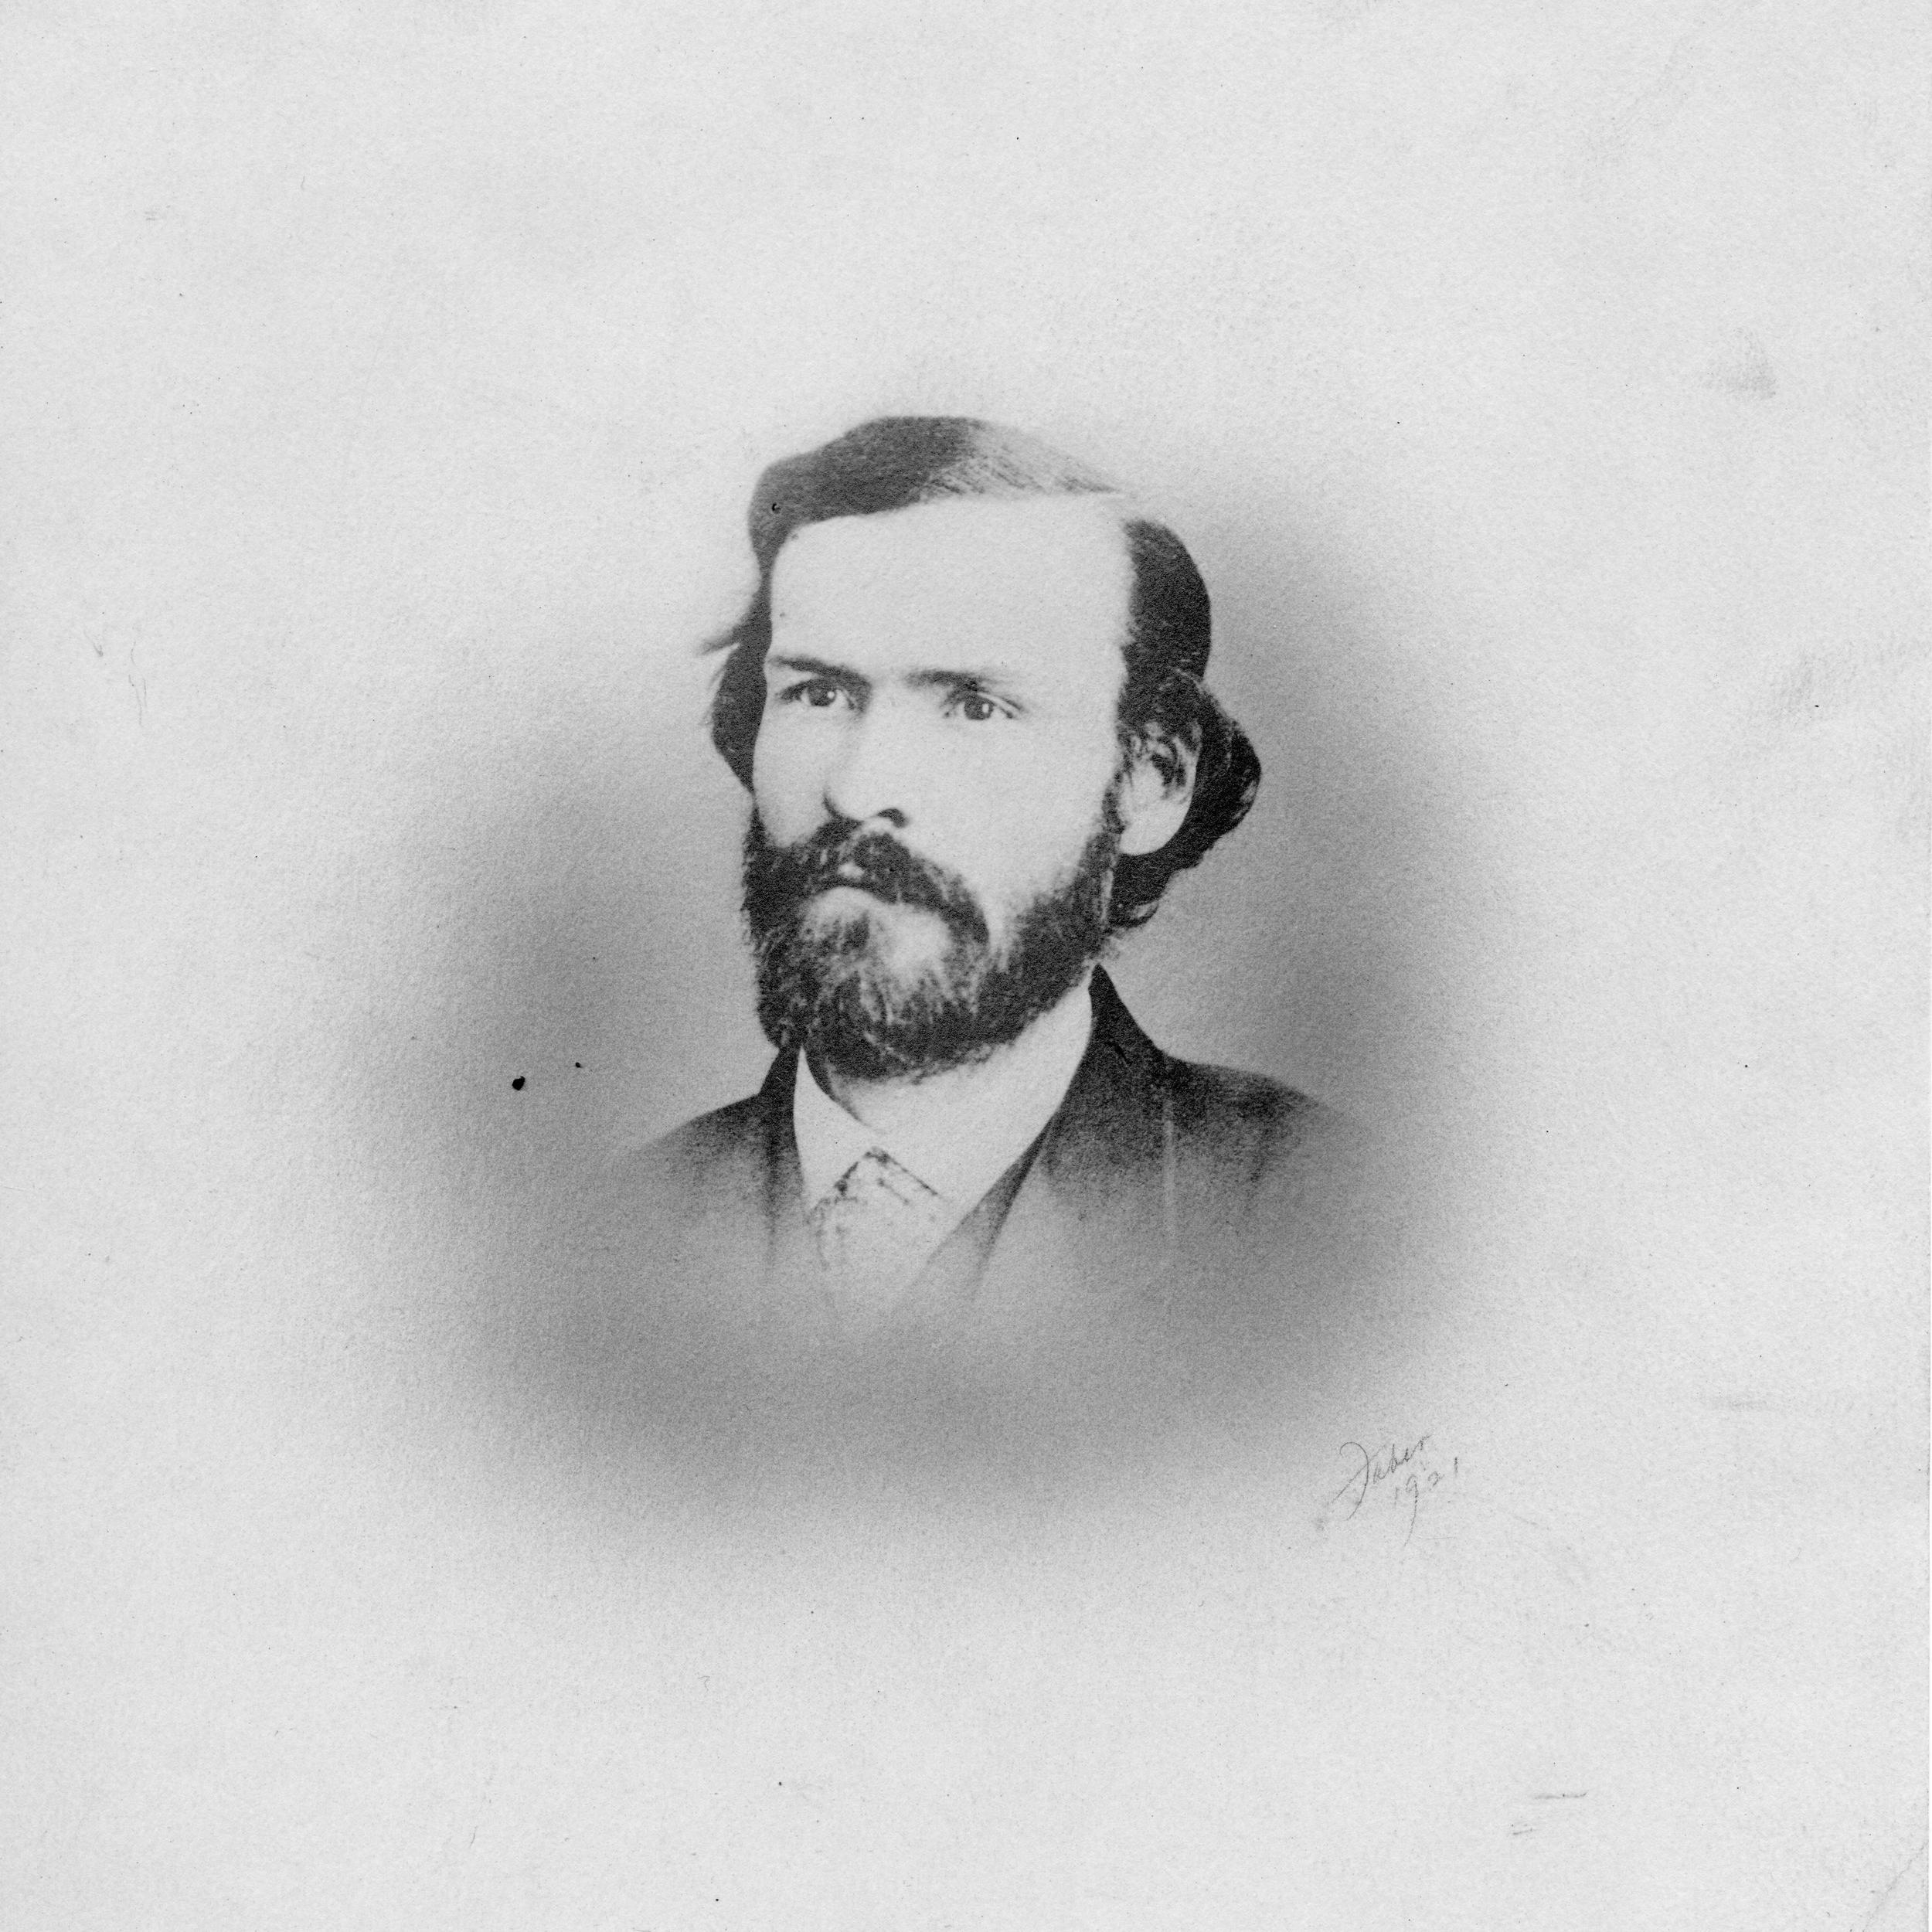 Abram Biggers, first superintendent of City Schools, 1871-1878